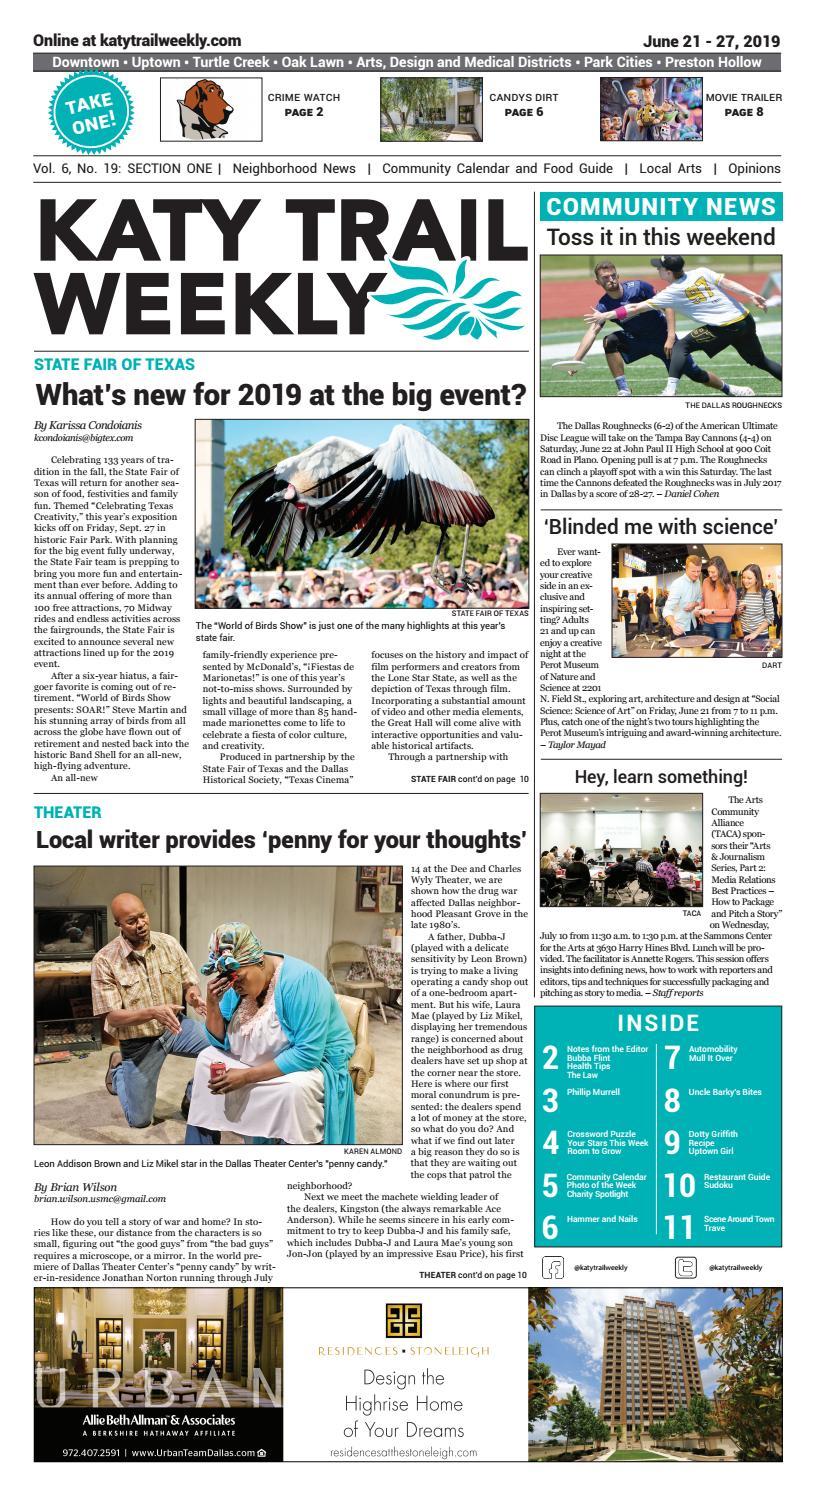 KTW 06-21-19 by Katy Trail Weekly - issuu